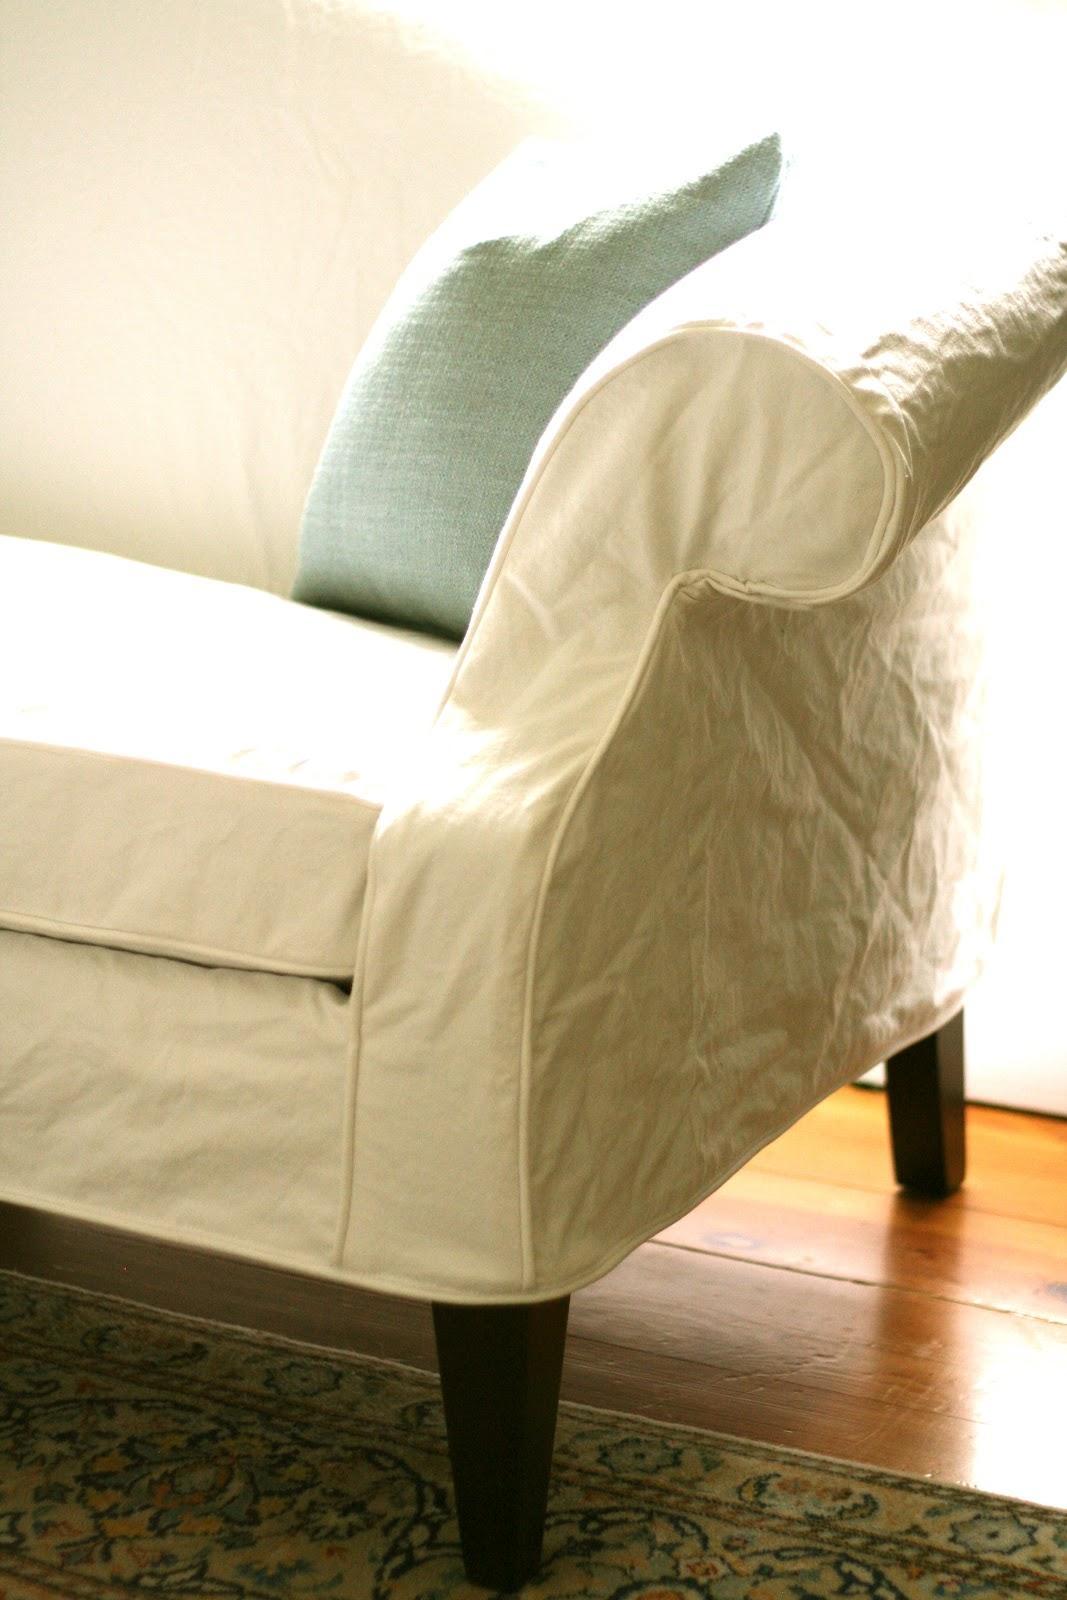 Custom Slipcoversshelley: White Camel Back Couch Regarding Camelback Slipcovers (View 13 of 20)